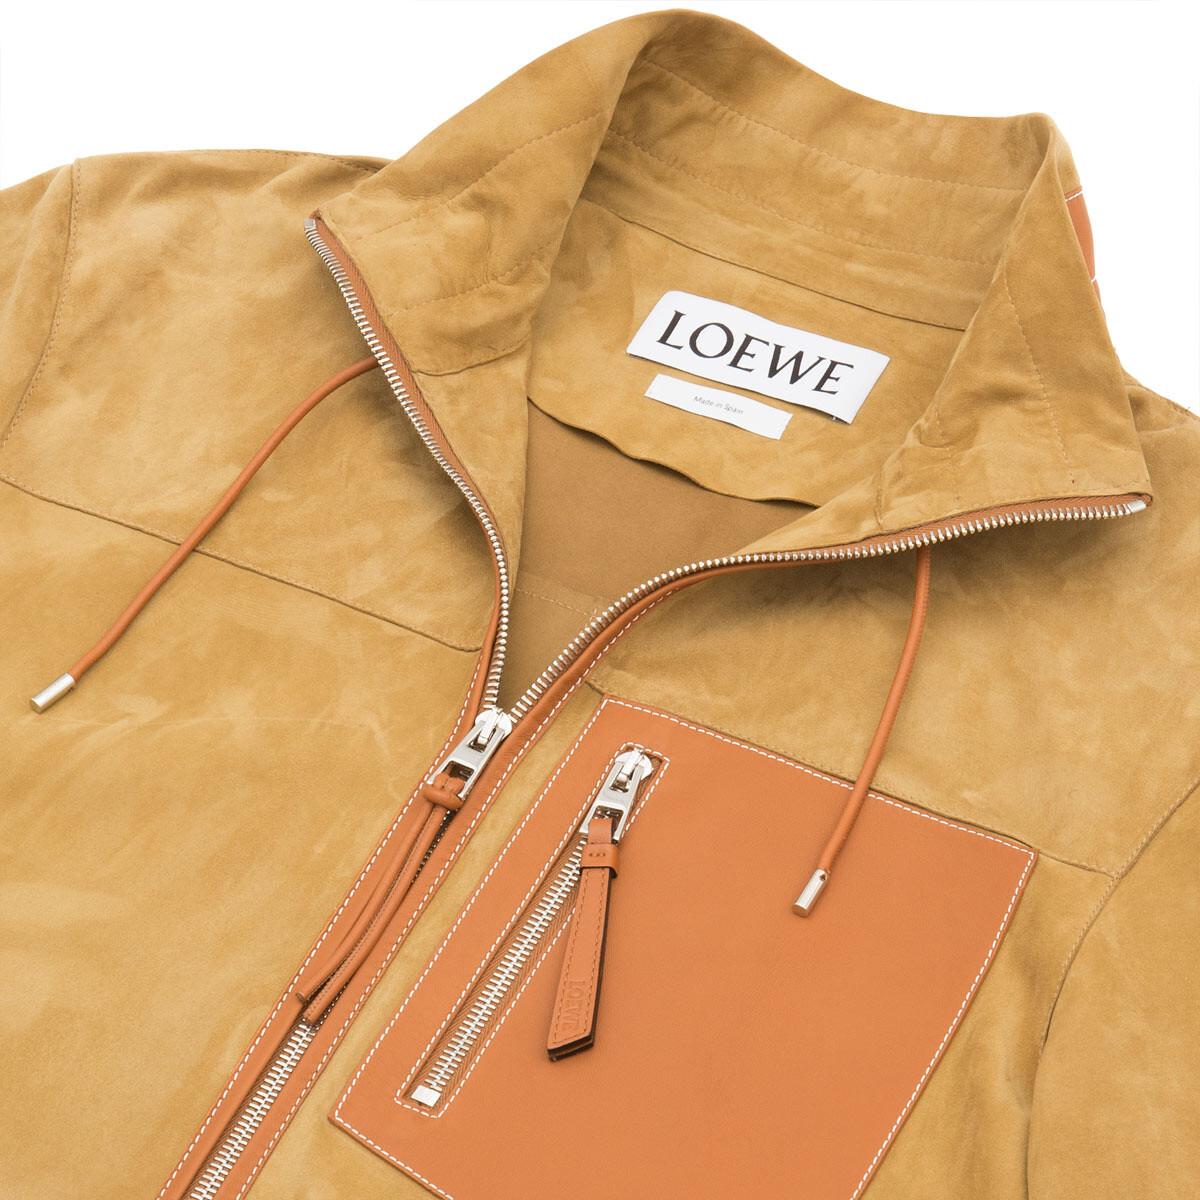 LOEWE Zip Blouson Gold/Tan front